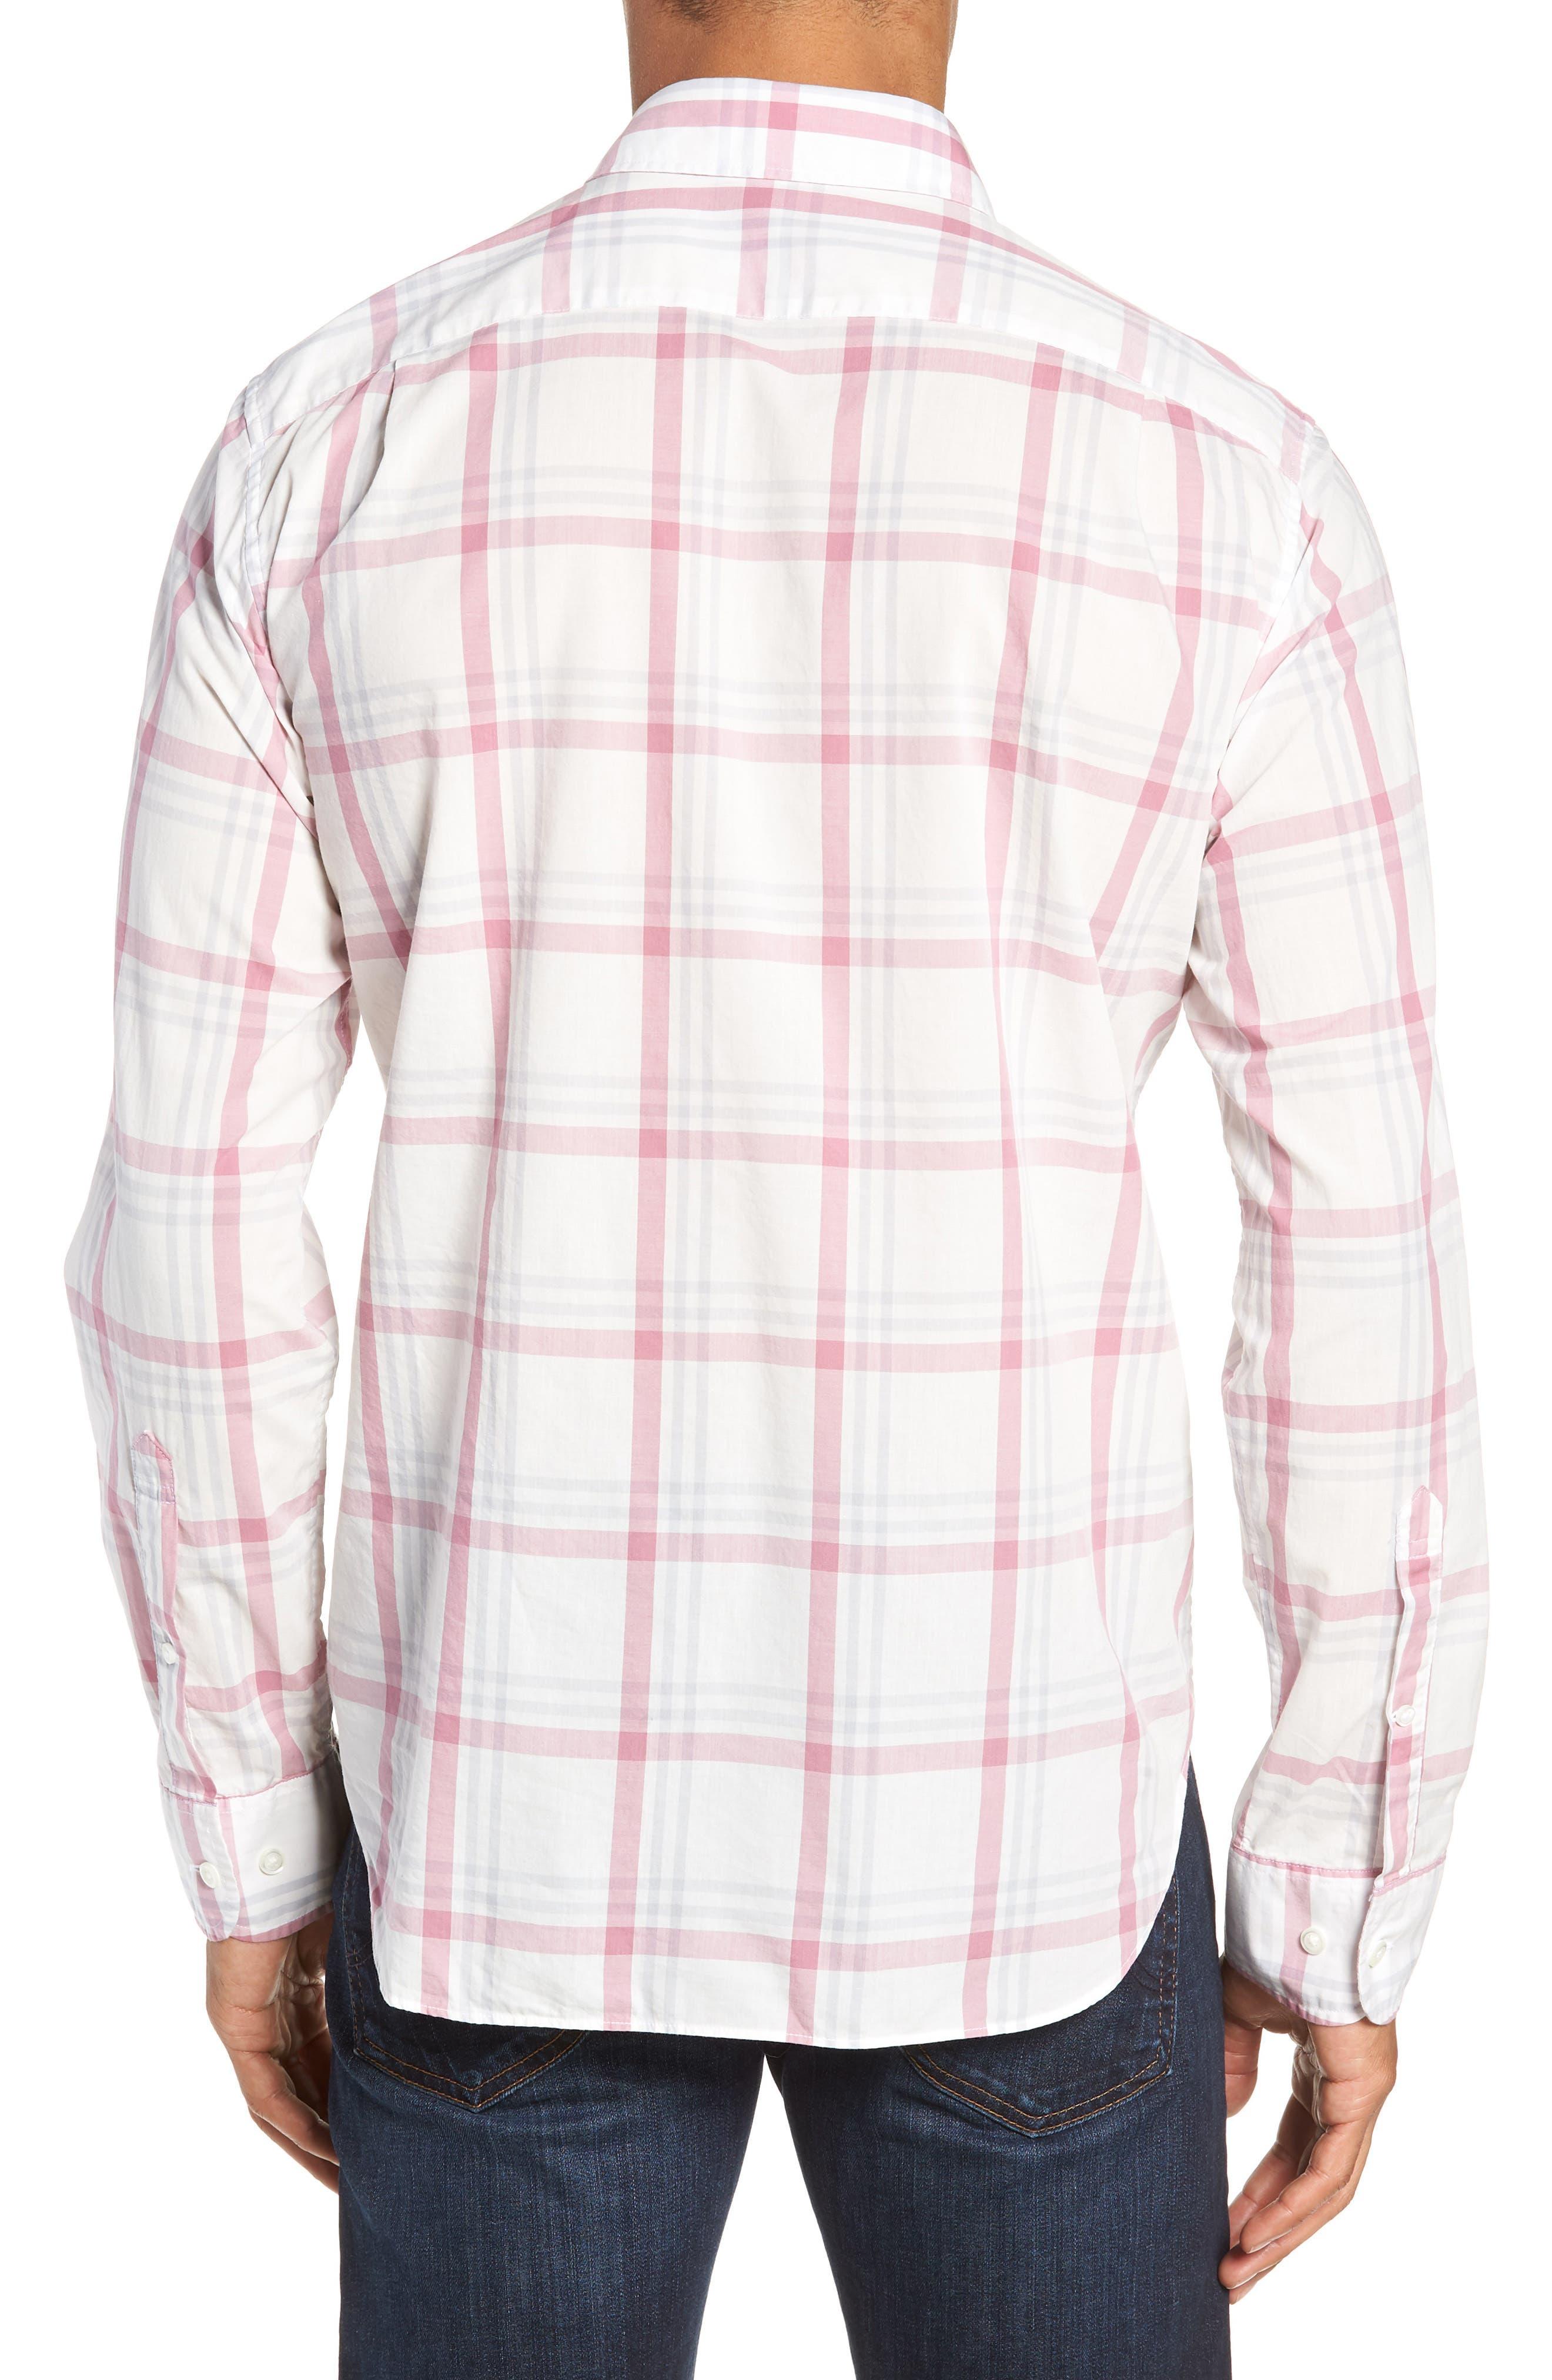 BONOBOS,                             Summerweight Slim Fit Plaid Sport Shirt,                             Alternate thumbnail 3, color,                             100